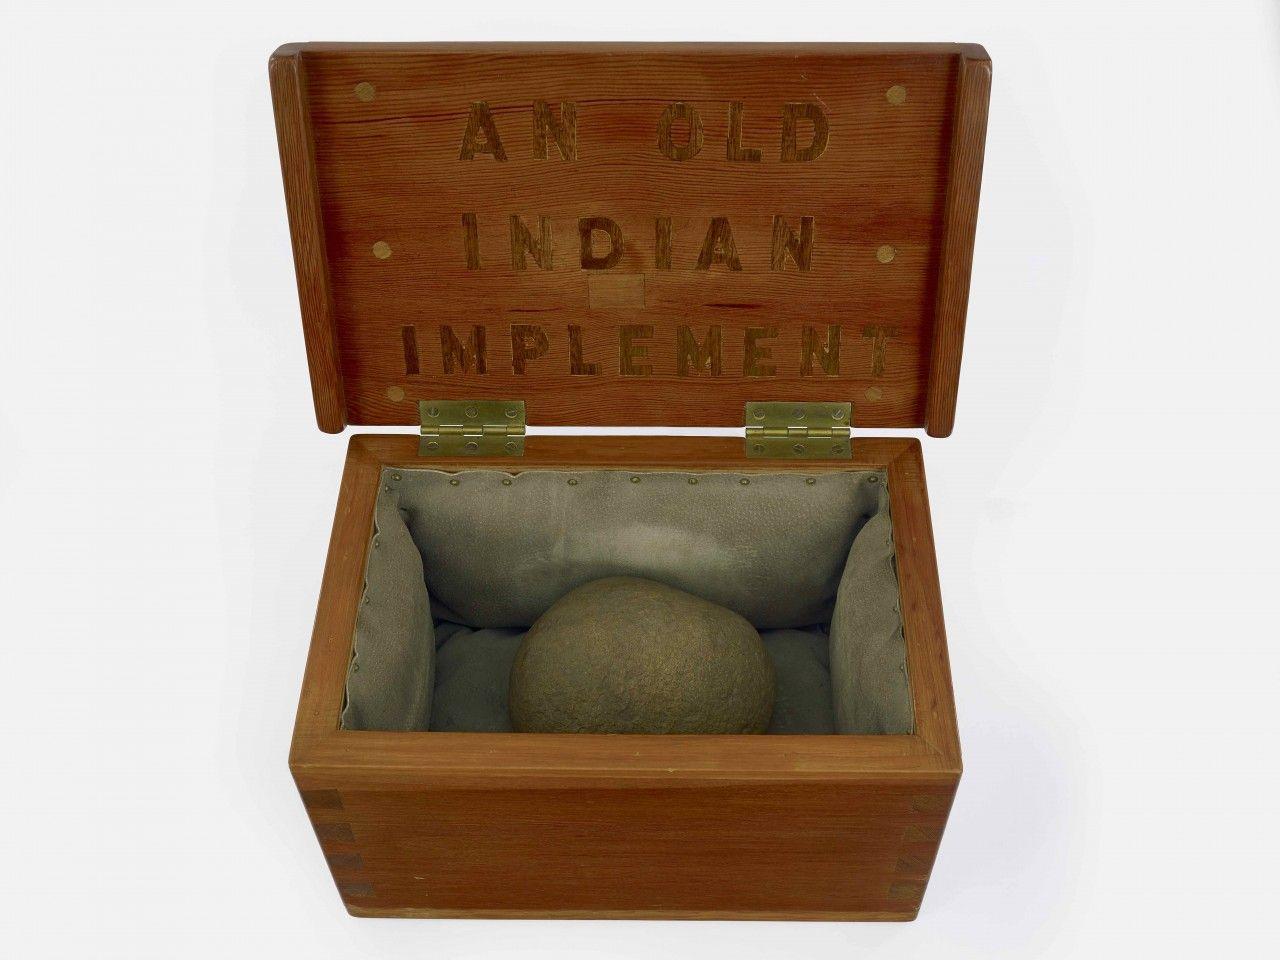 H.C. Westermann, An Old Indian Implement, 1971. Douglas fir, connecticut fieldstone, pigskin, walnut, 10 x 18 x 10 3/4 inches.